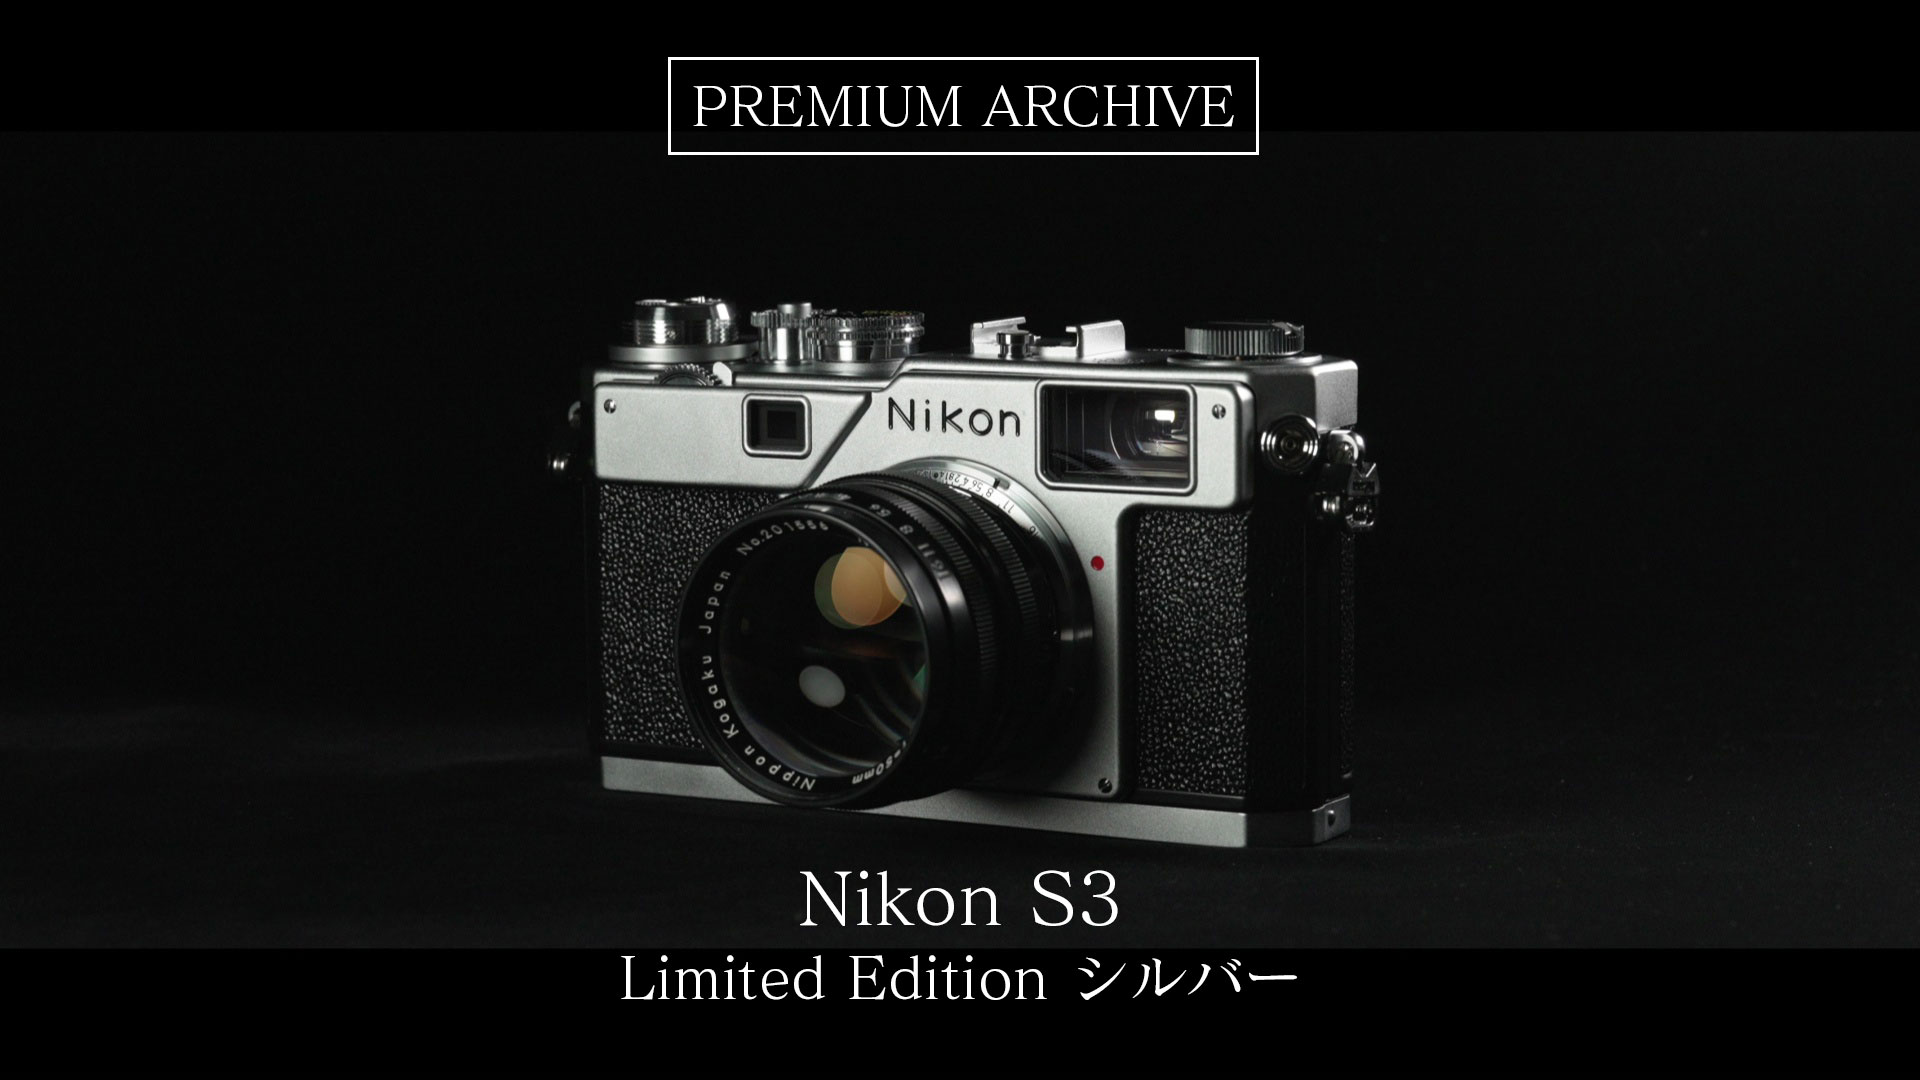 【PREMIUM ARCHIVE #03】Nikon S3 Limited Edition シルバー